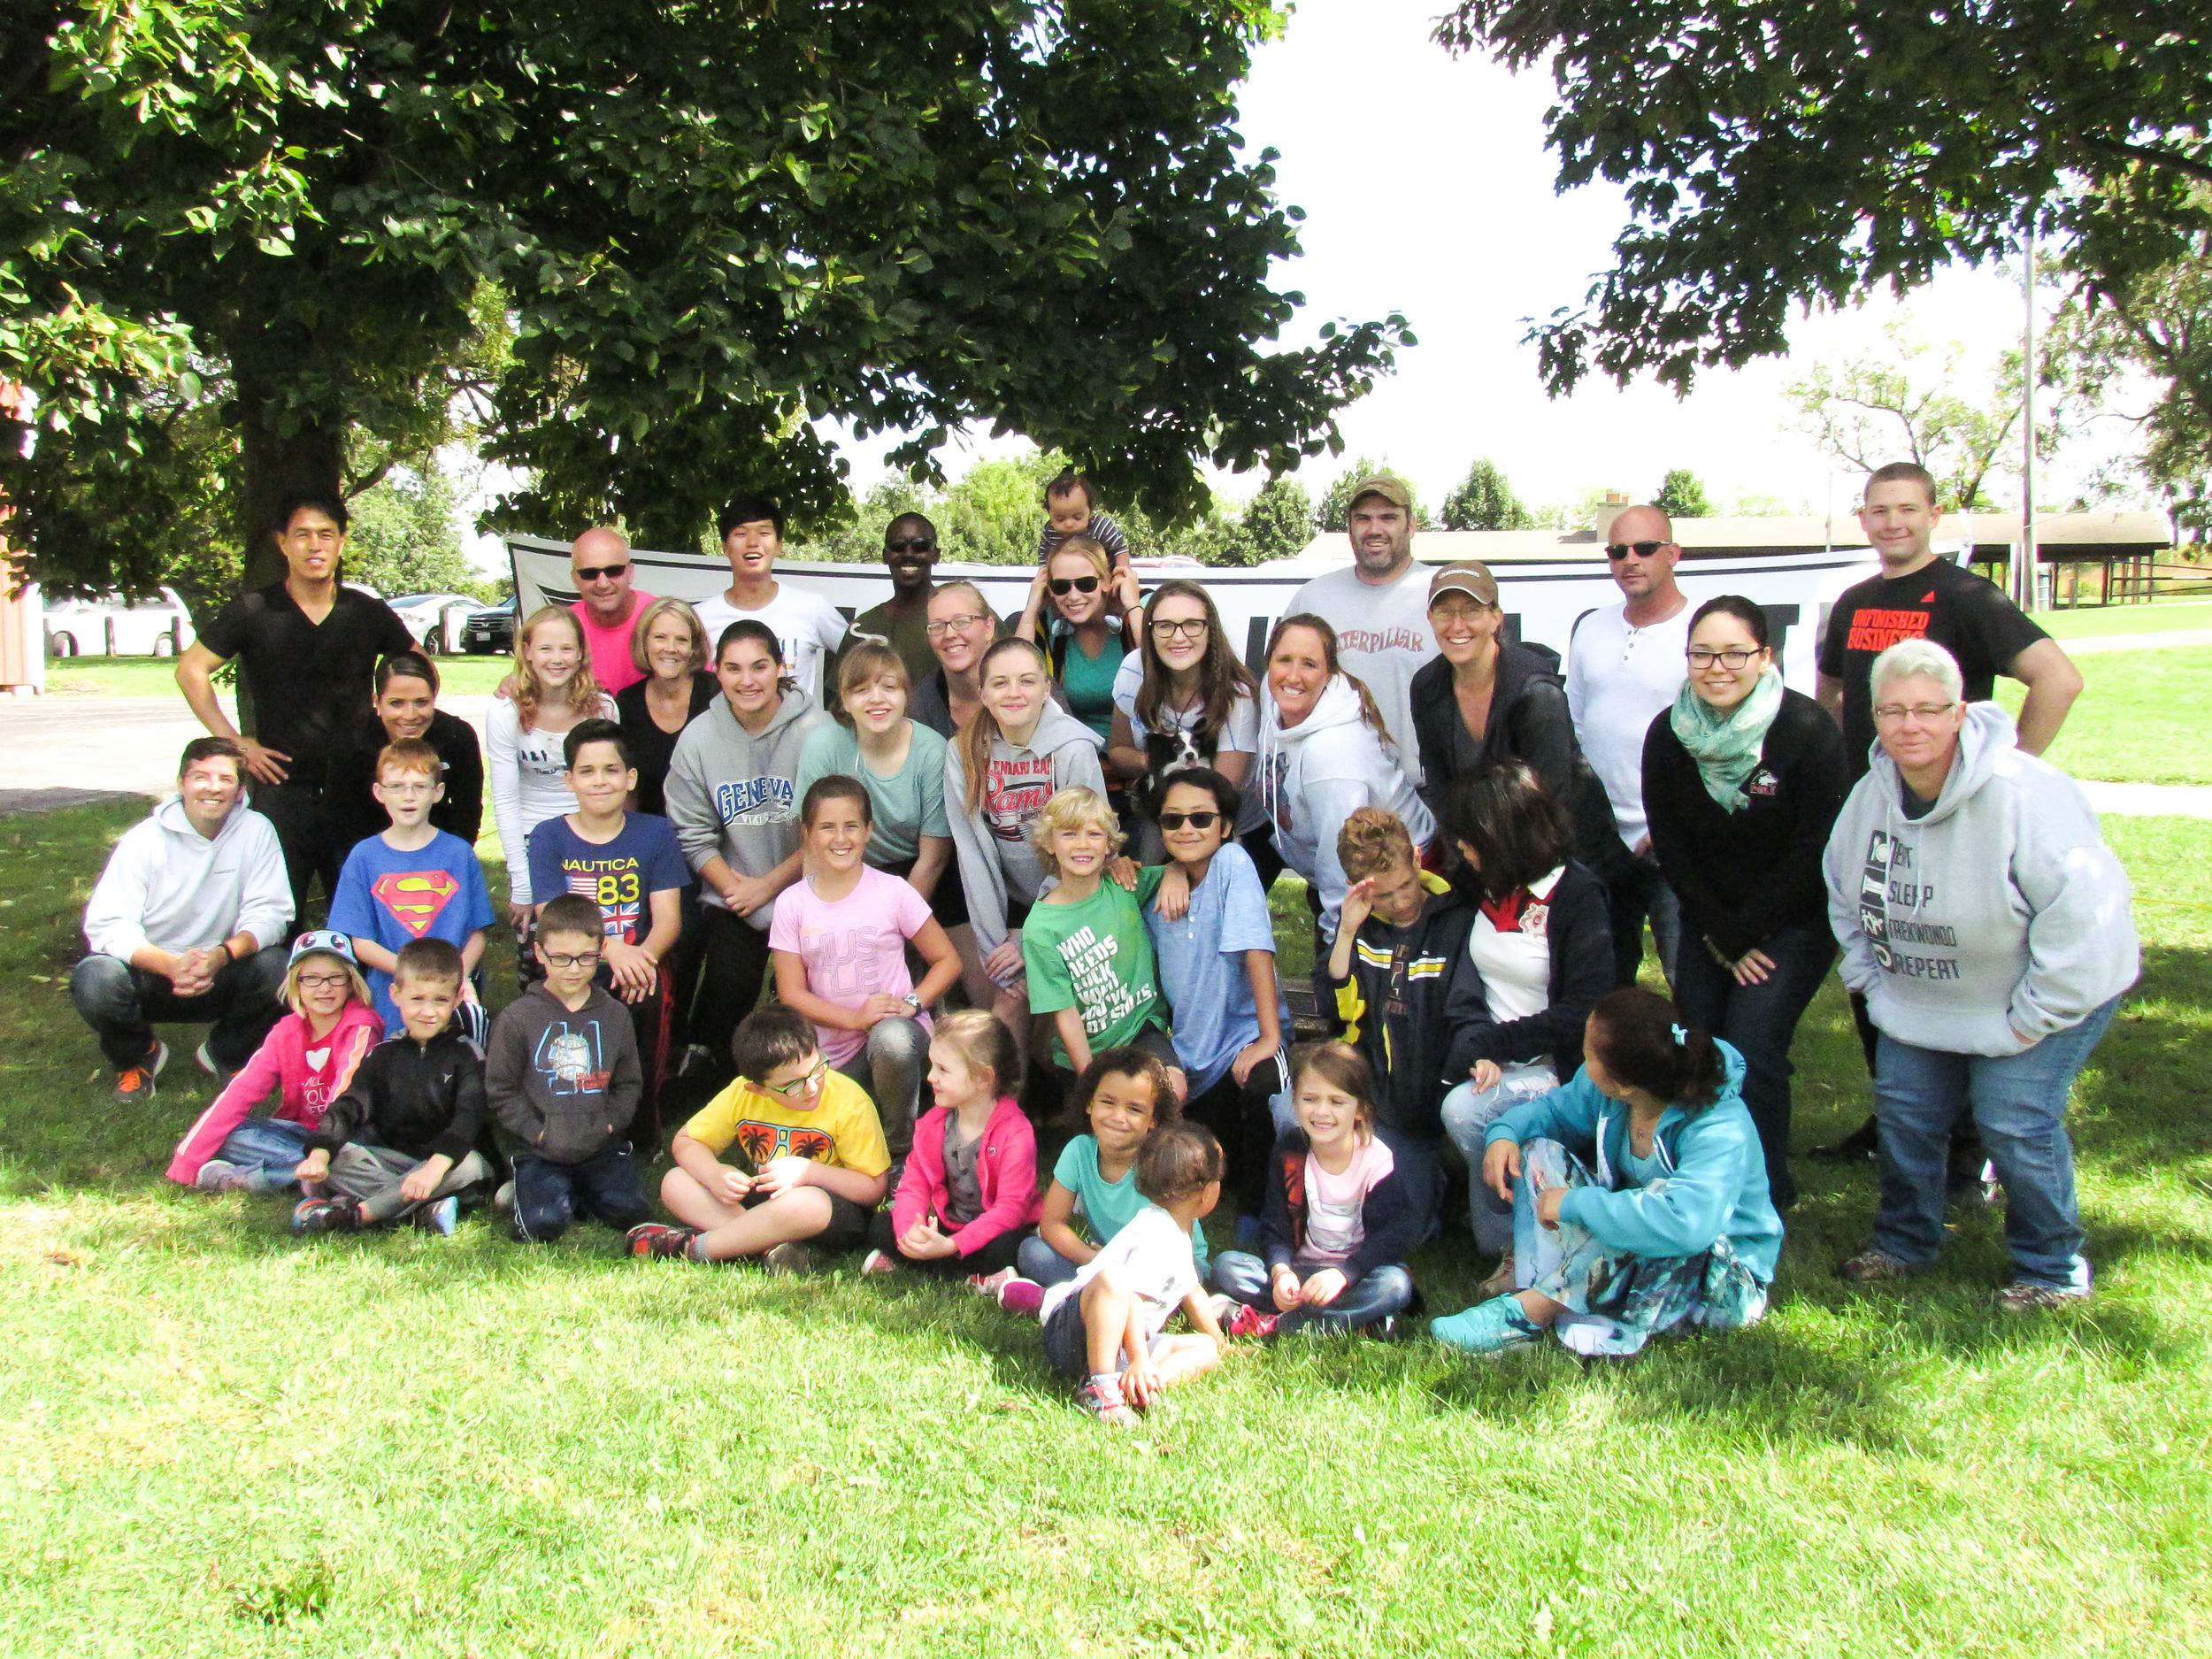 2015.09.19 TKC picnic (76).jpg